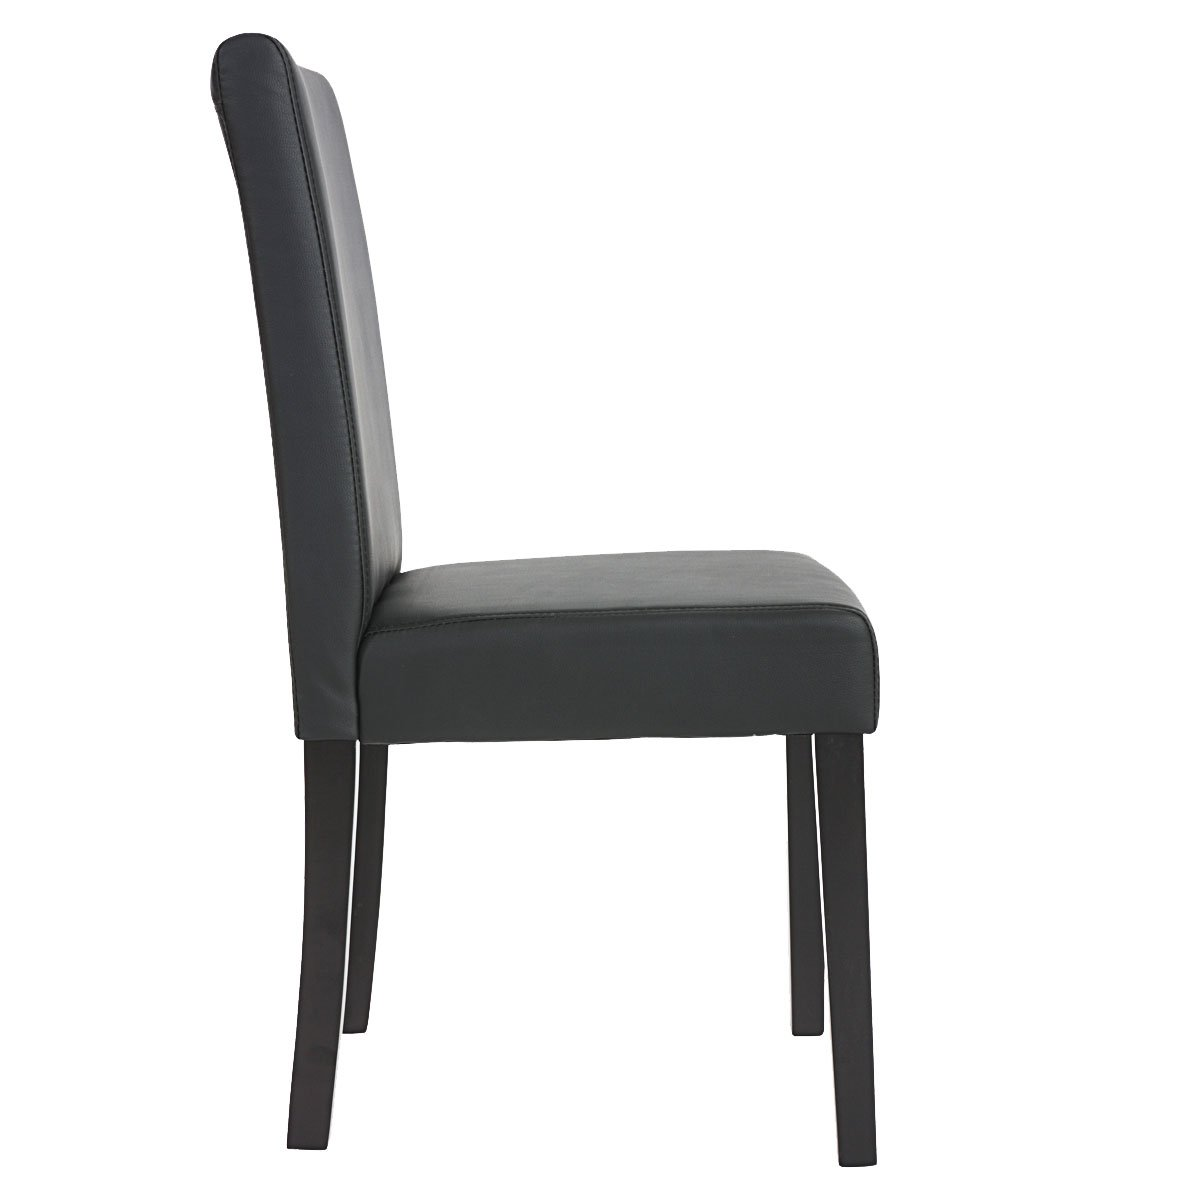 Lote 4 sillas de comedor litau piel mate negra lote 4 for Sillas negras comedor